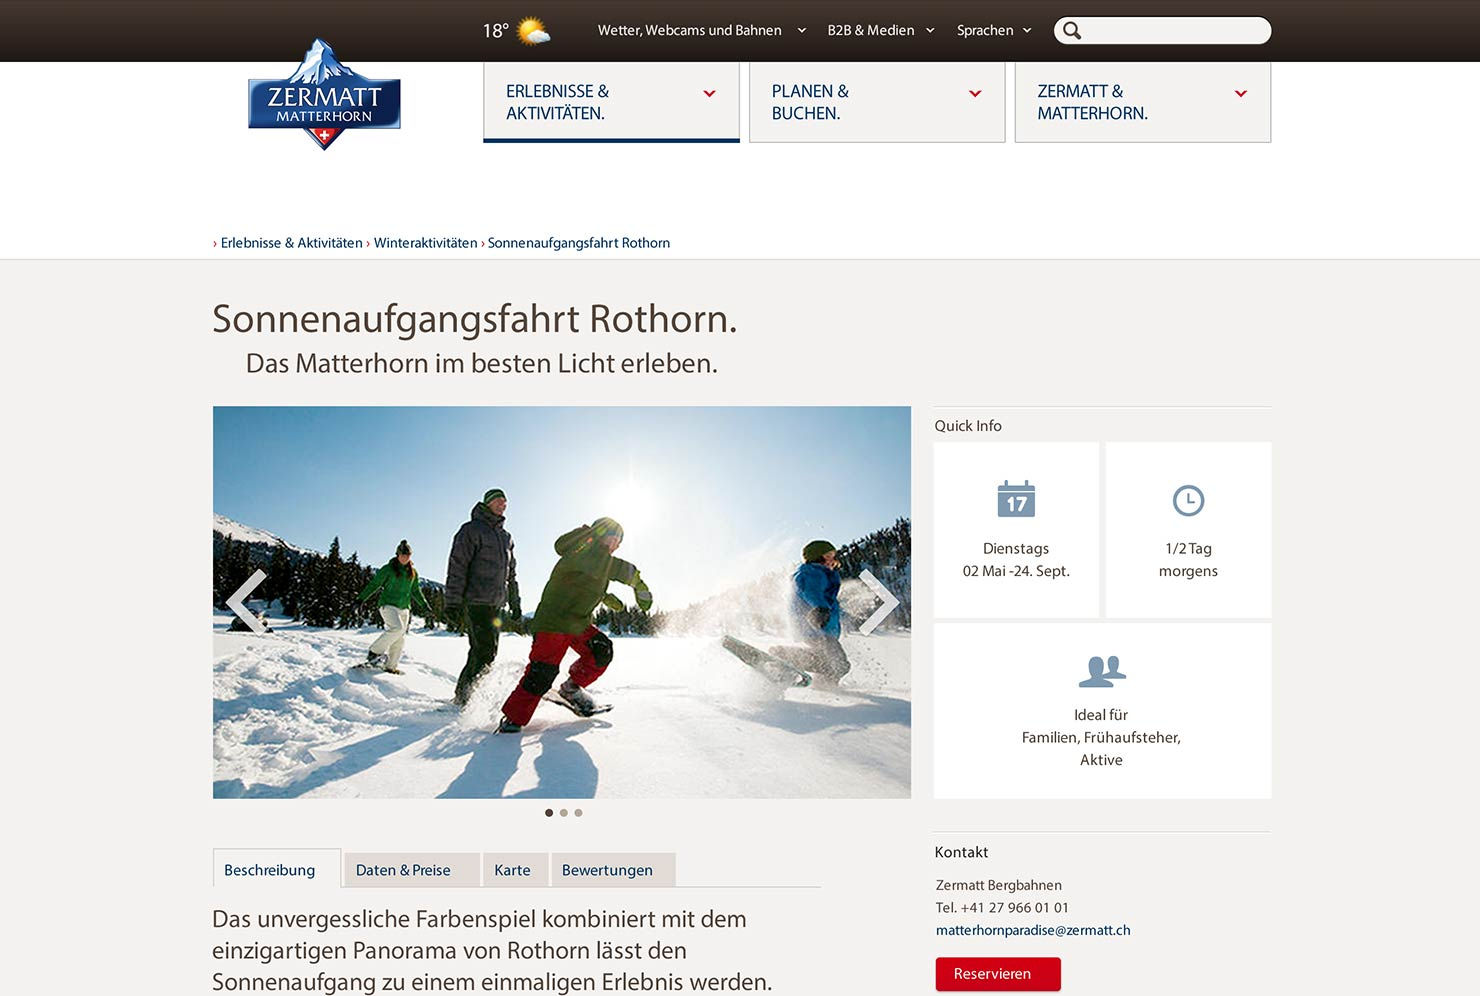 Tourismus Website - Detailseite slide 2